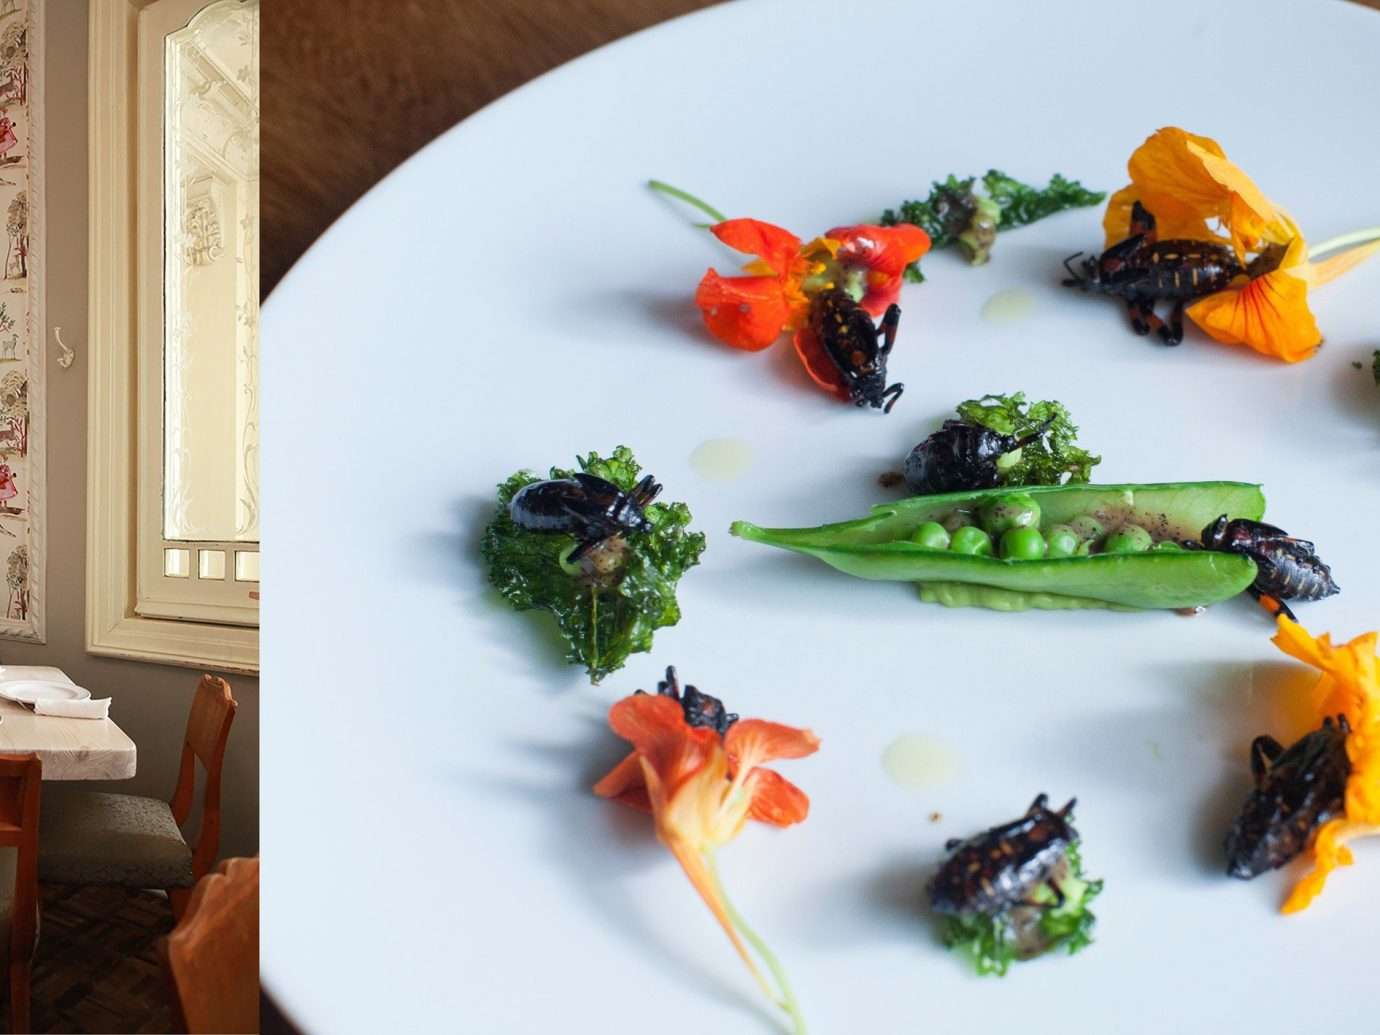 Trip Ideas plate food meal dish white produce brunch flower lunch vegetable dinner arranged meat piece de resistance